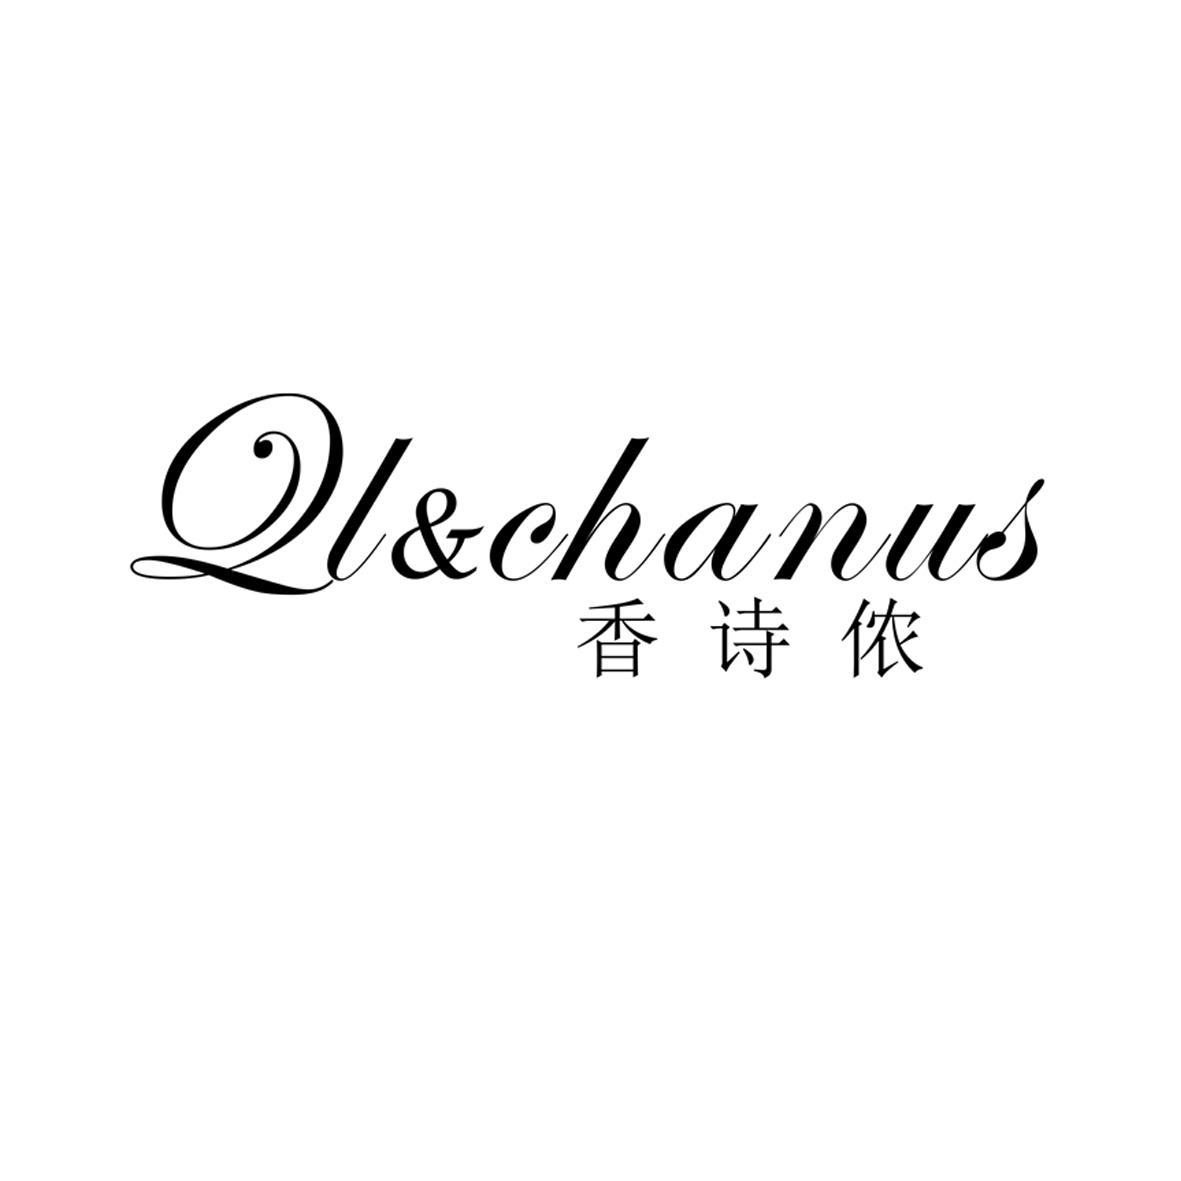 QL&chanus香诗侬